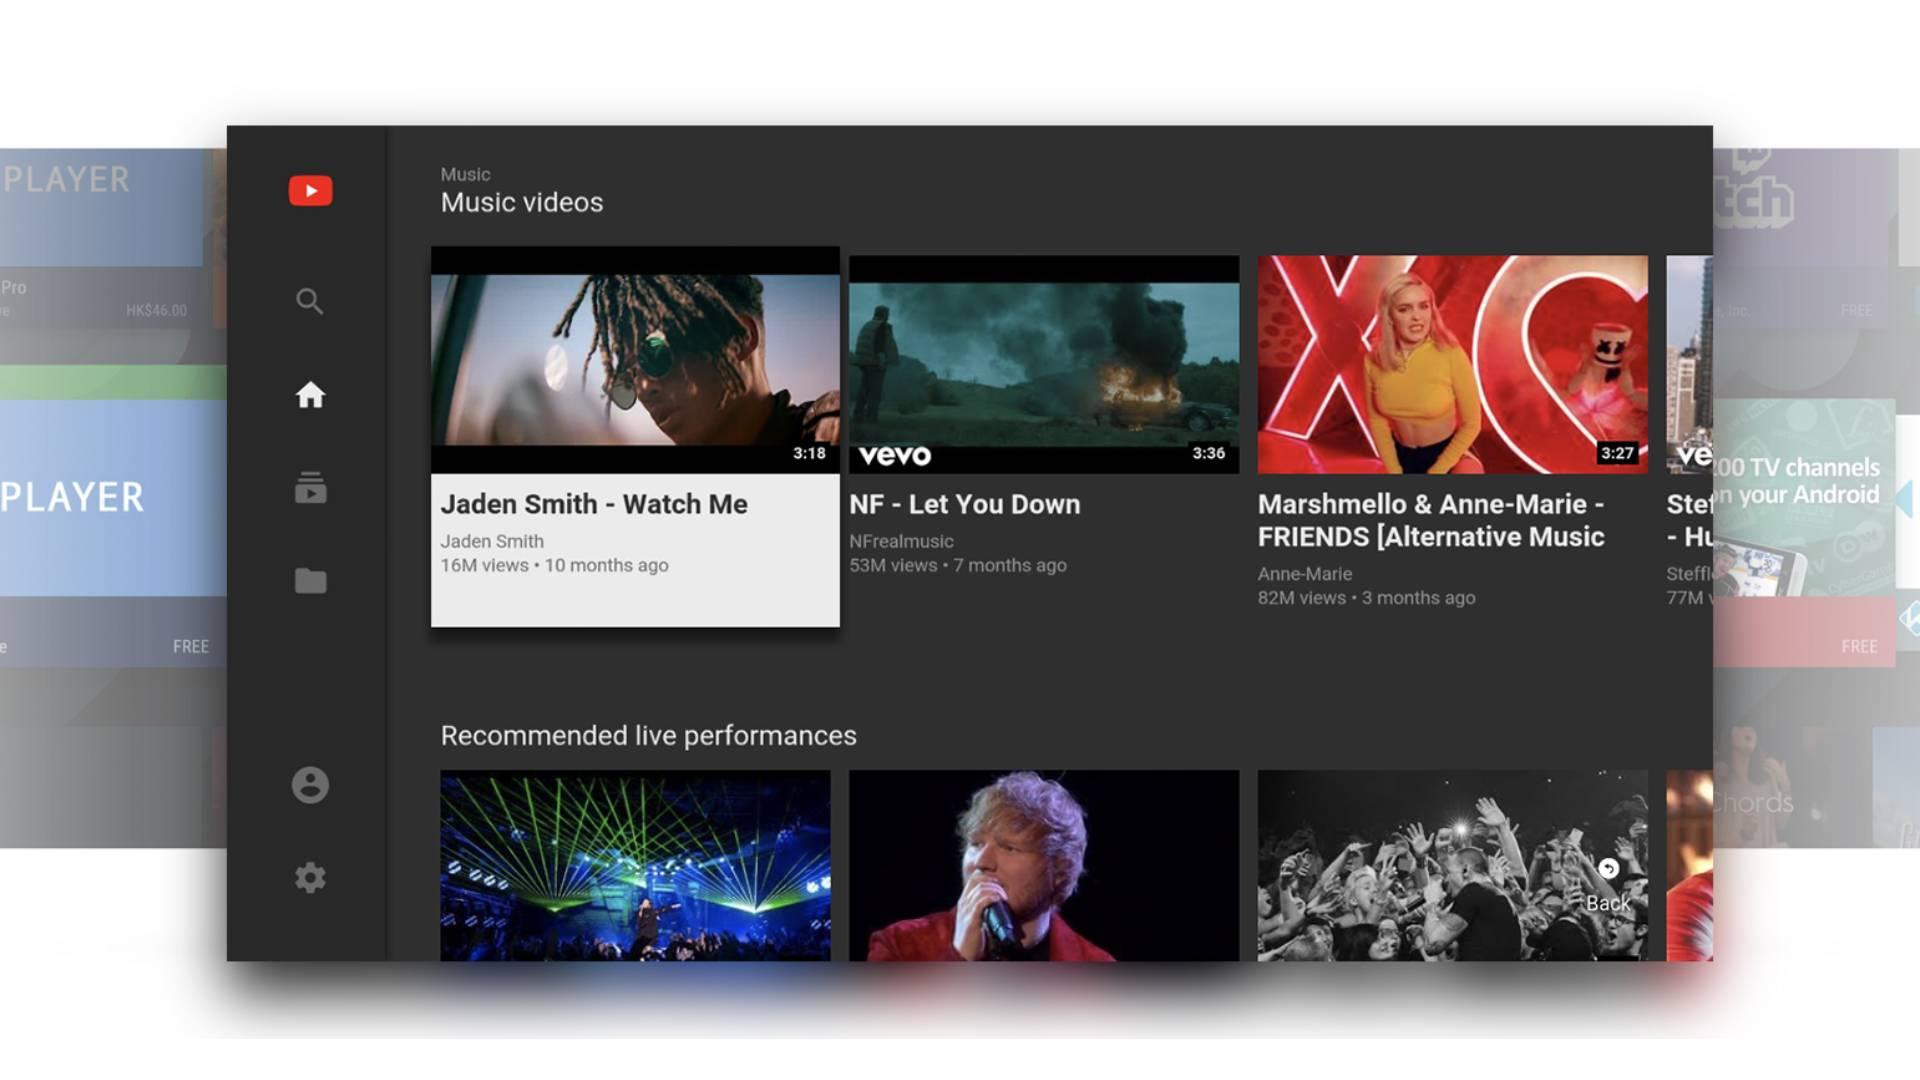 TCL LED Smart TV Youtube